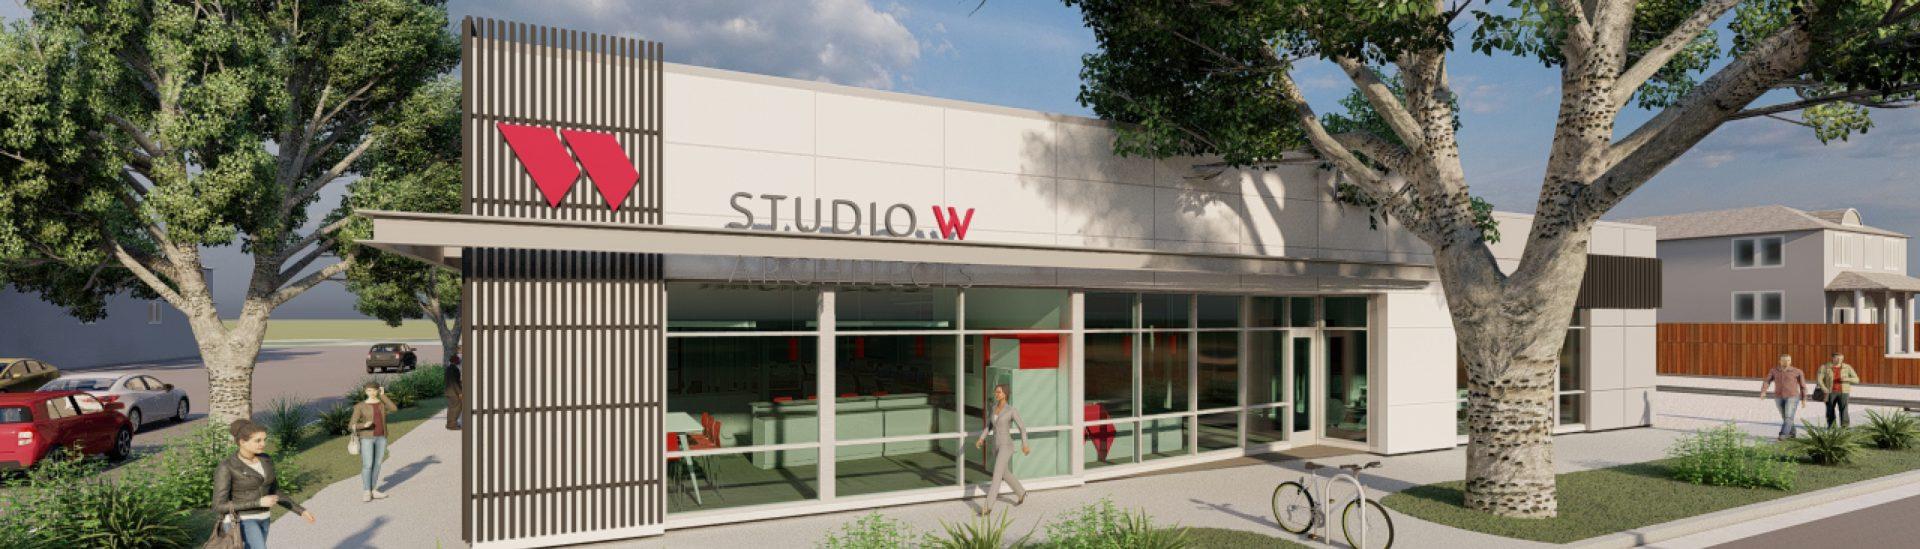 "Sacramento Business Journal: ""Studio W Architects Wrapping Up New Midtown Sacramento Location"""